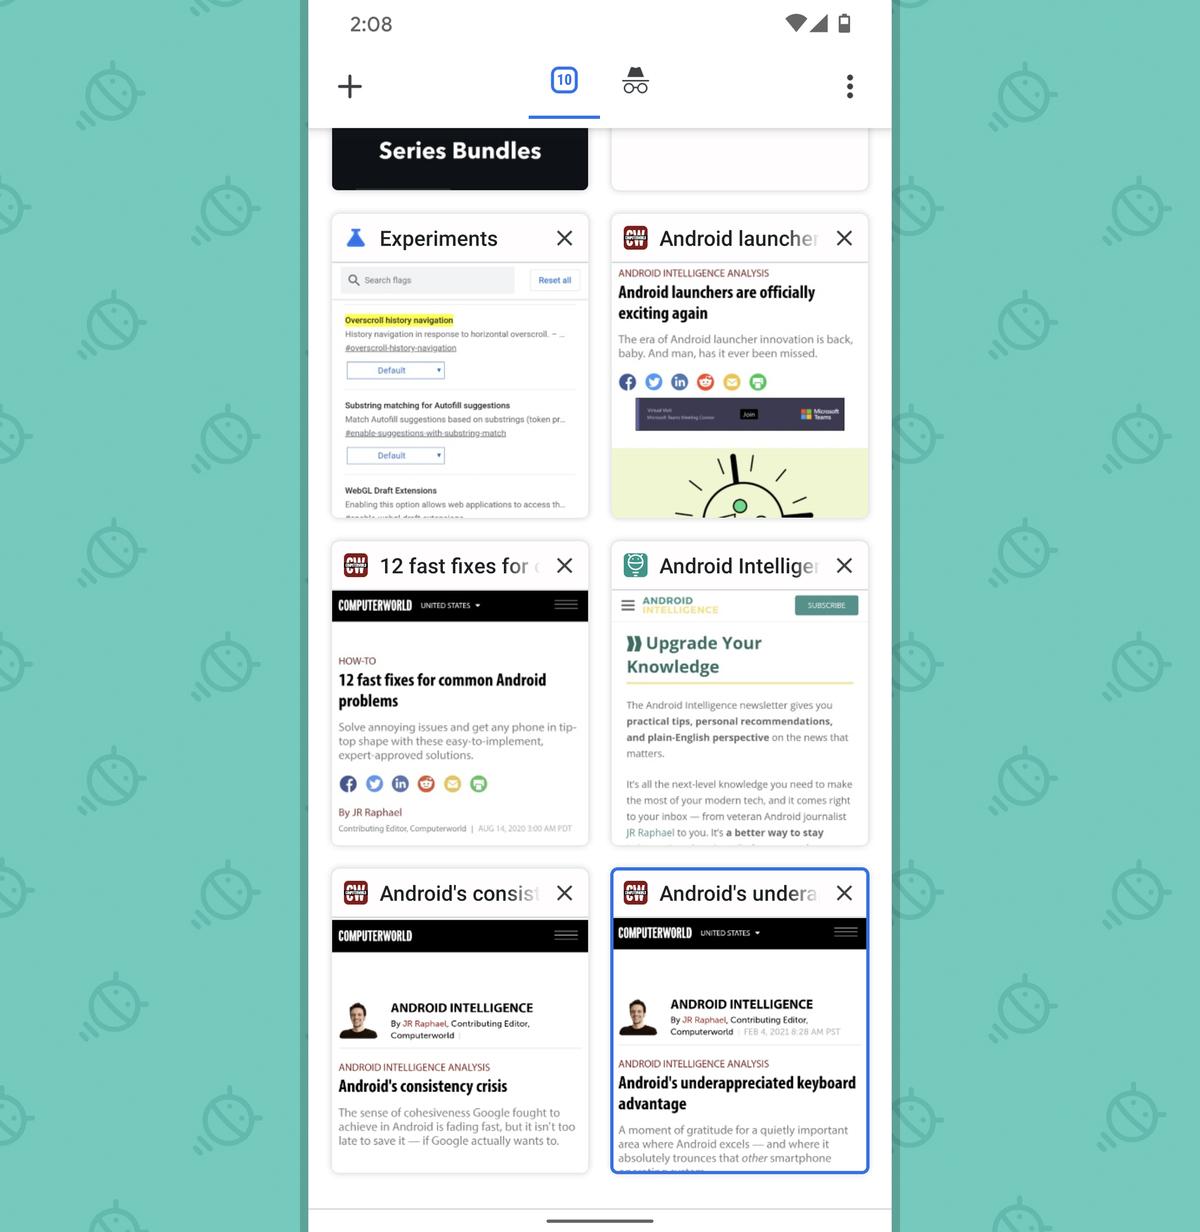 Chrome Android Settings: Tab grid